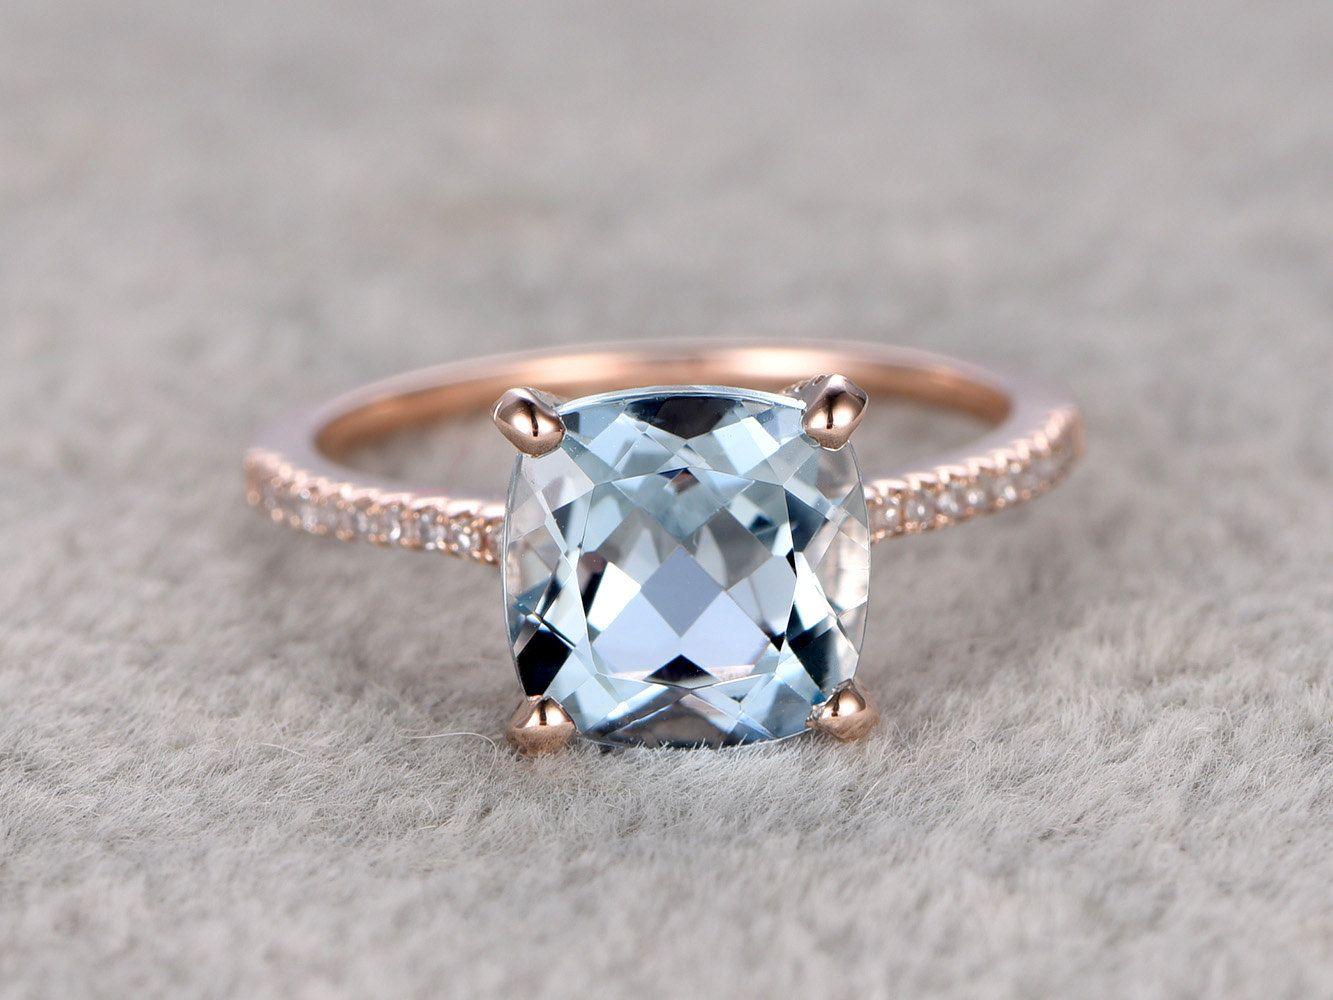 Jewelry & Watches Diamond Fine 2.3ct Round Cut Diamond Engagement Ring 14k White Gold Finish Flower Solitaire